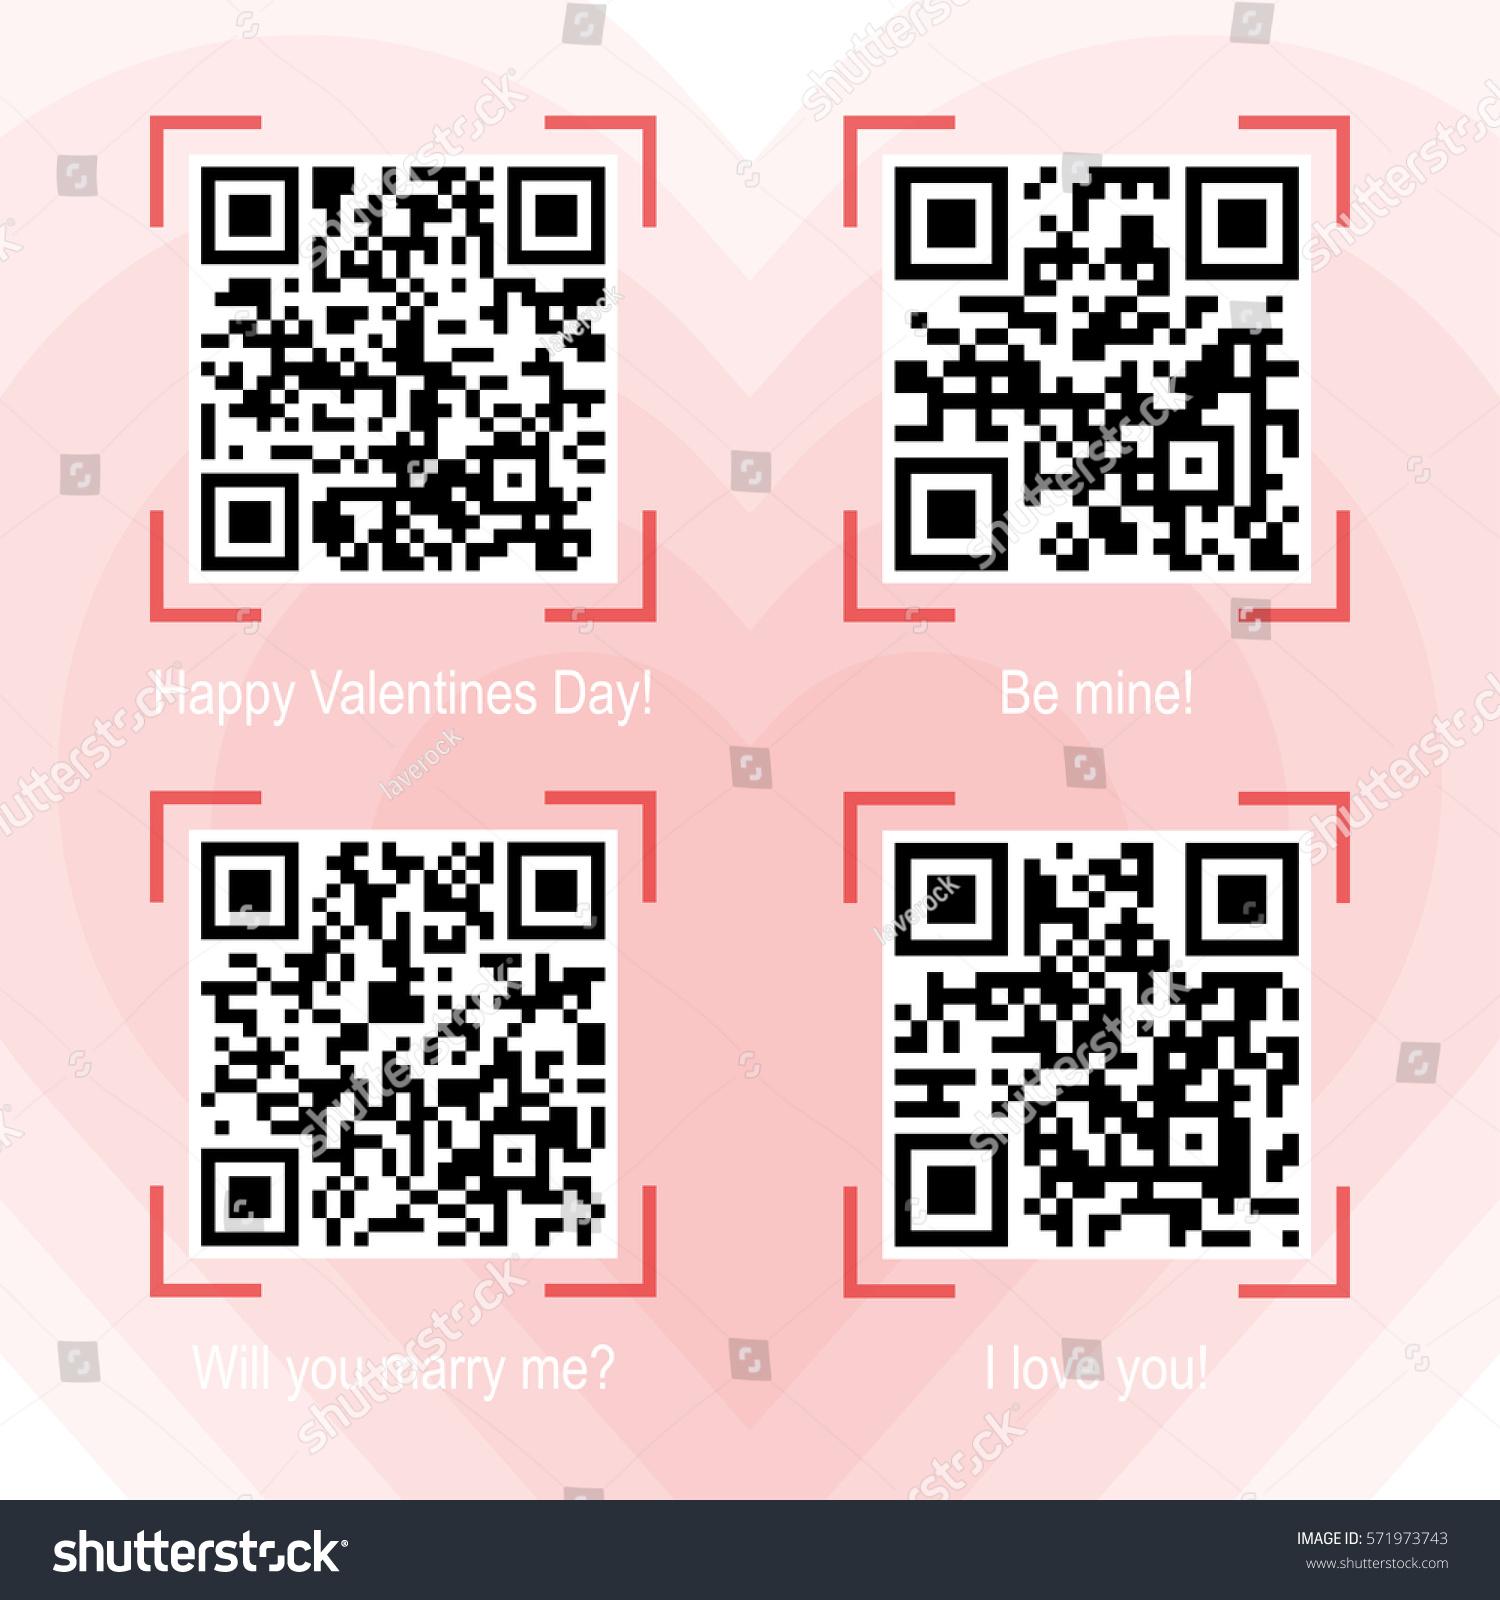 Vector Illustration Qr Code Samples On Stock Vector (Royalty